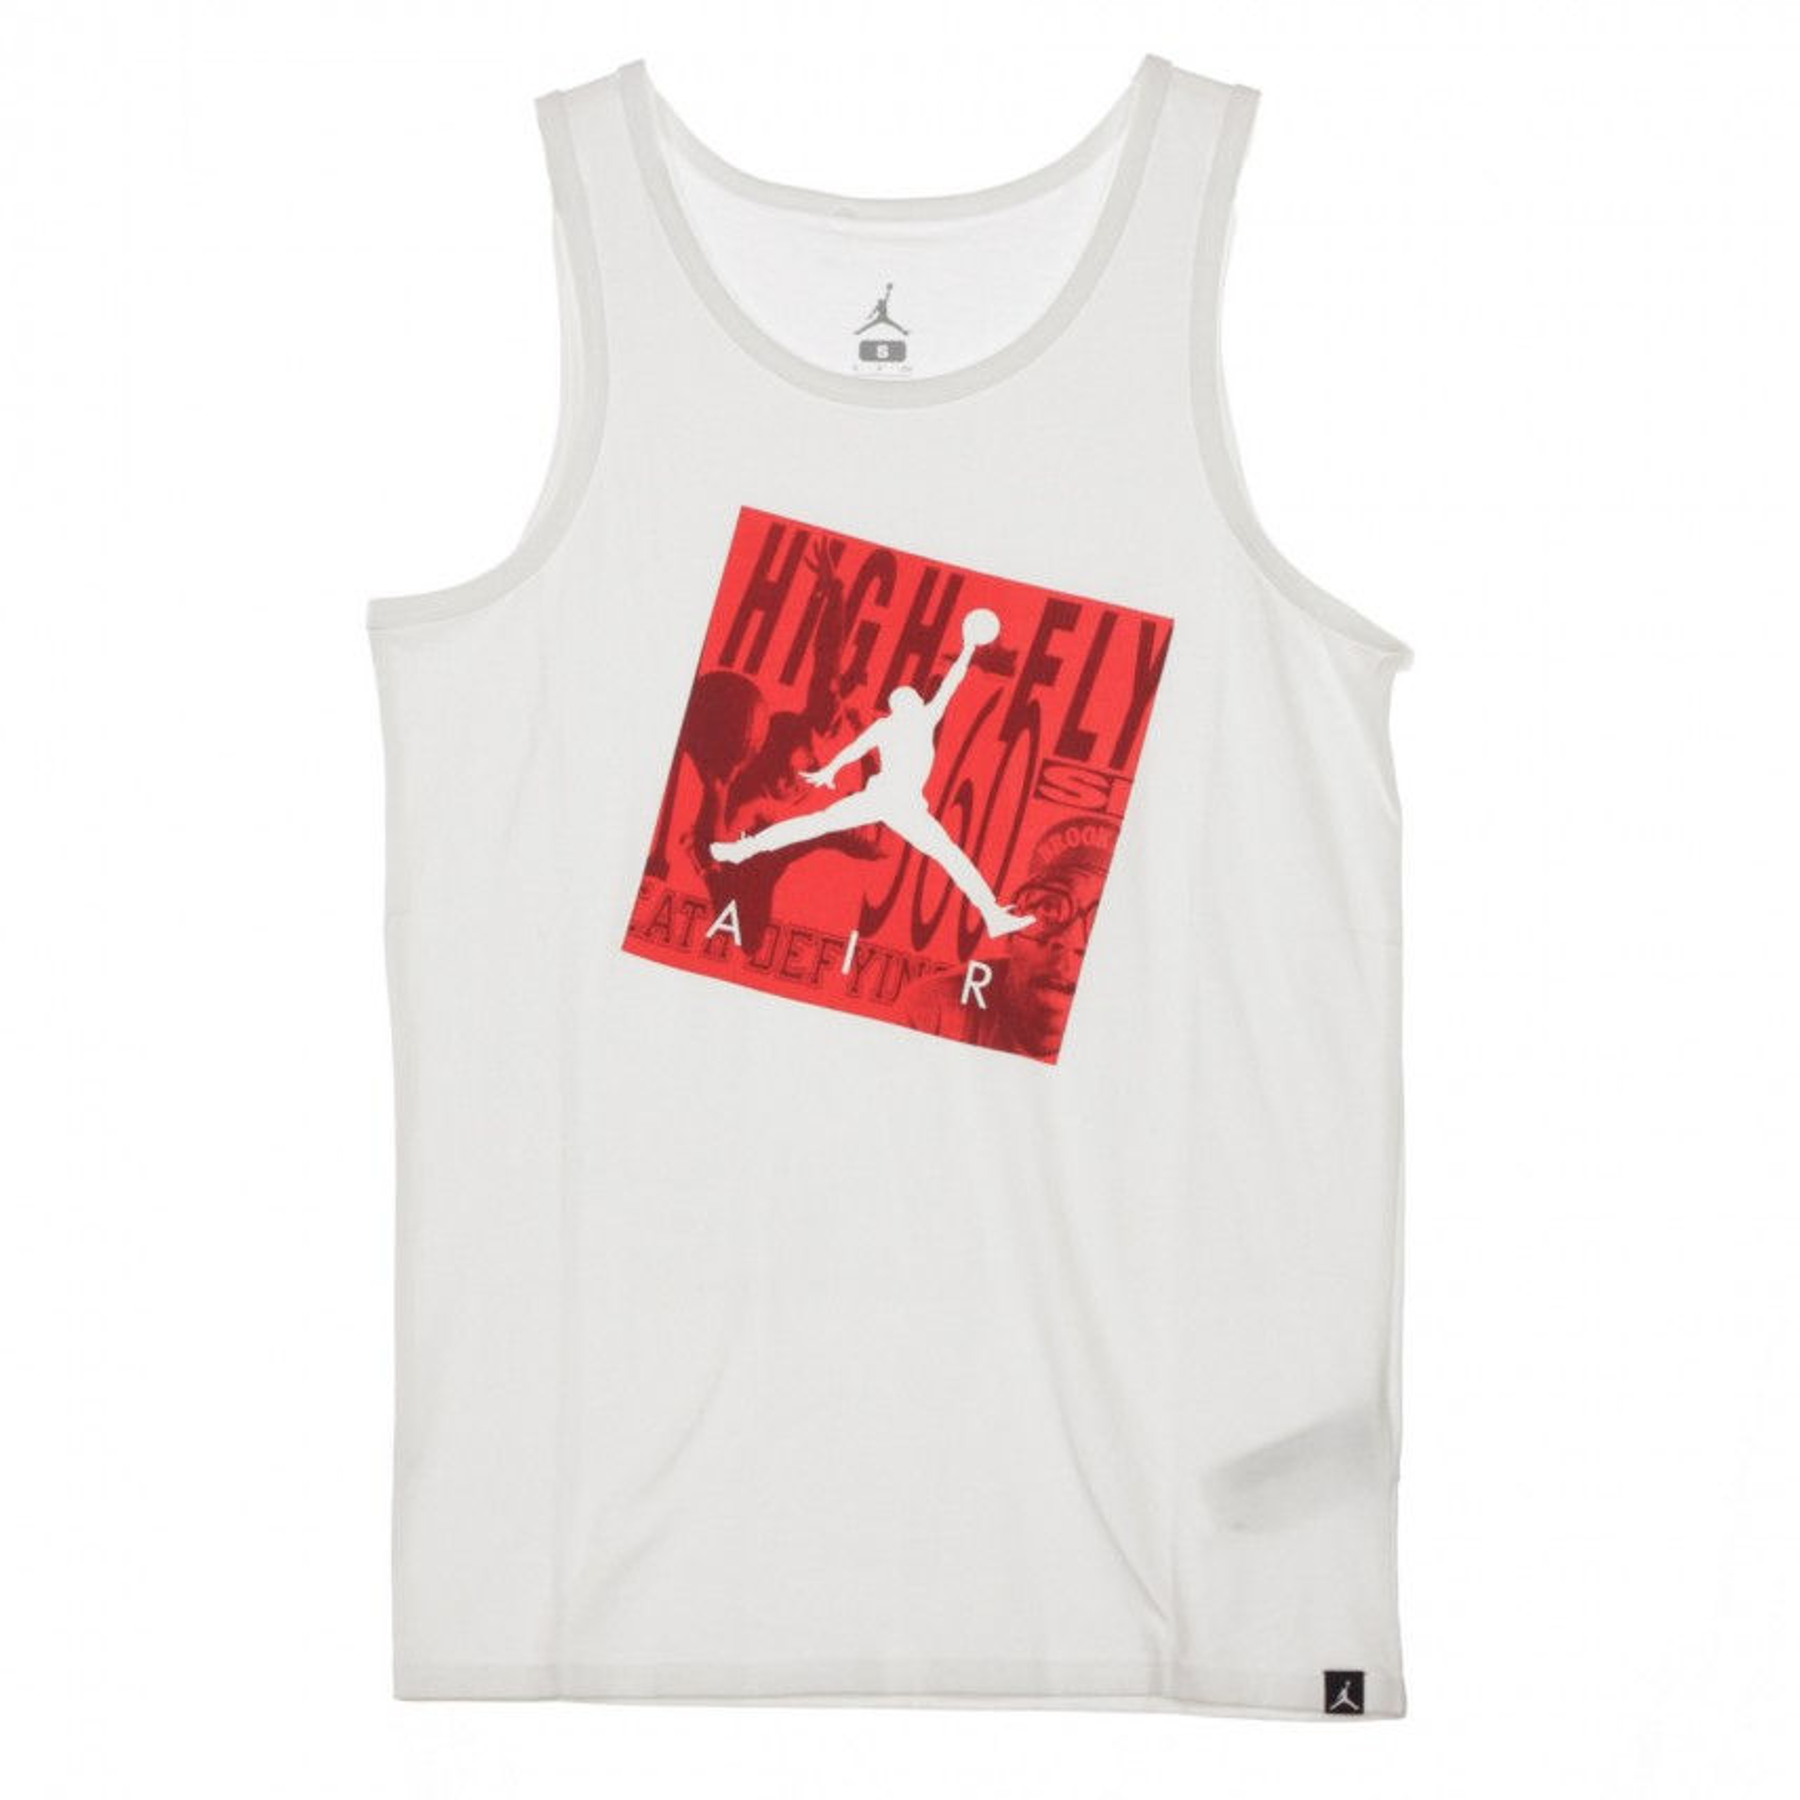 CANOTTA TANK HBR JUMPMAN AIR WHITE UNIVERSITY RED  a21da90393b8